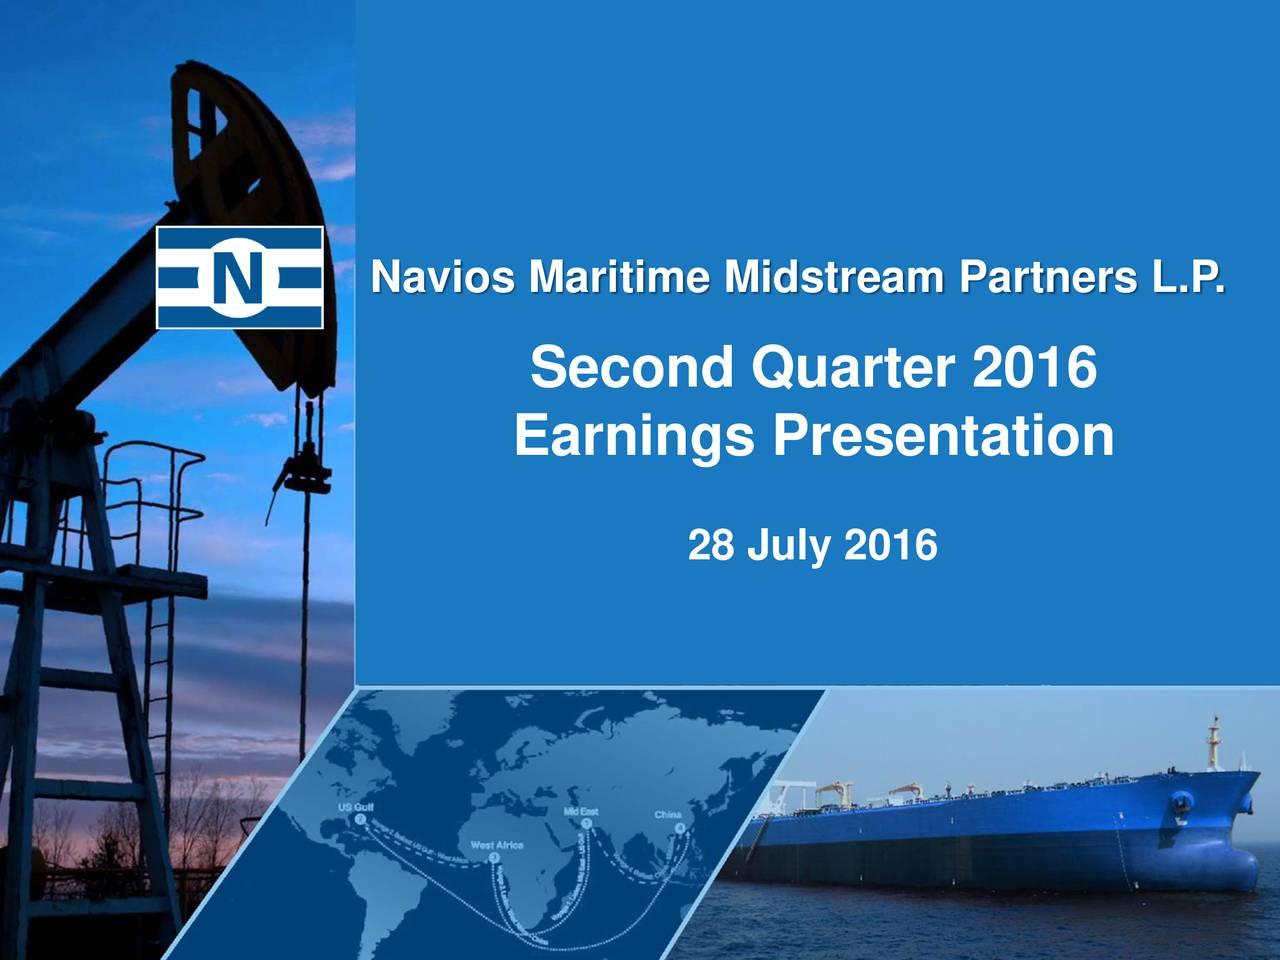 Second Quarter 2016 Earnings Presentation 28 July 2016